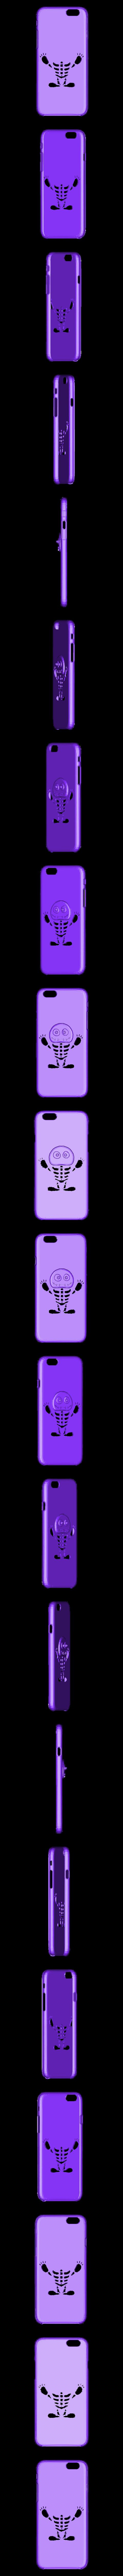 iPhone6s Monster Case.stl Download STL file iPhone 6s Skeletor Case • 3D printing object, eMBe85